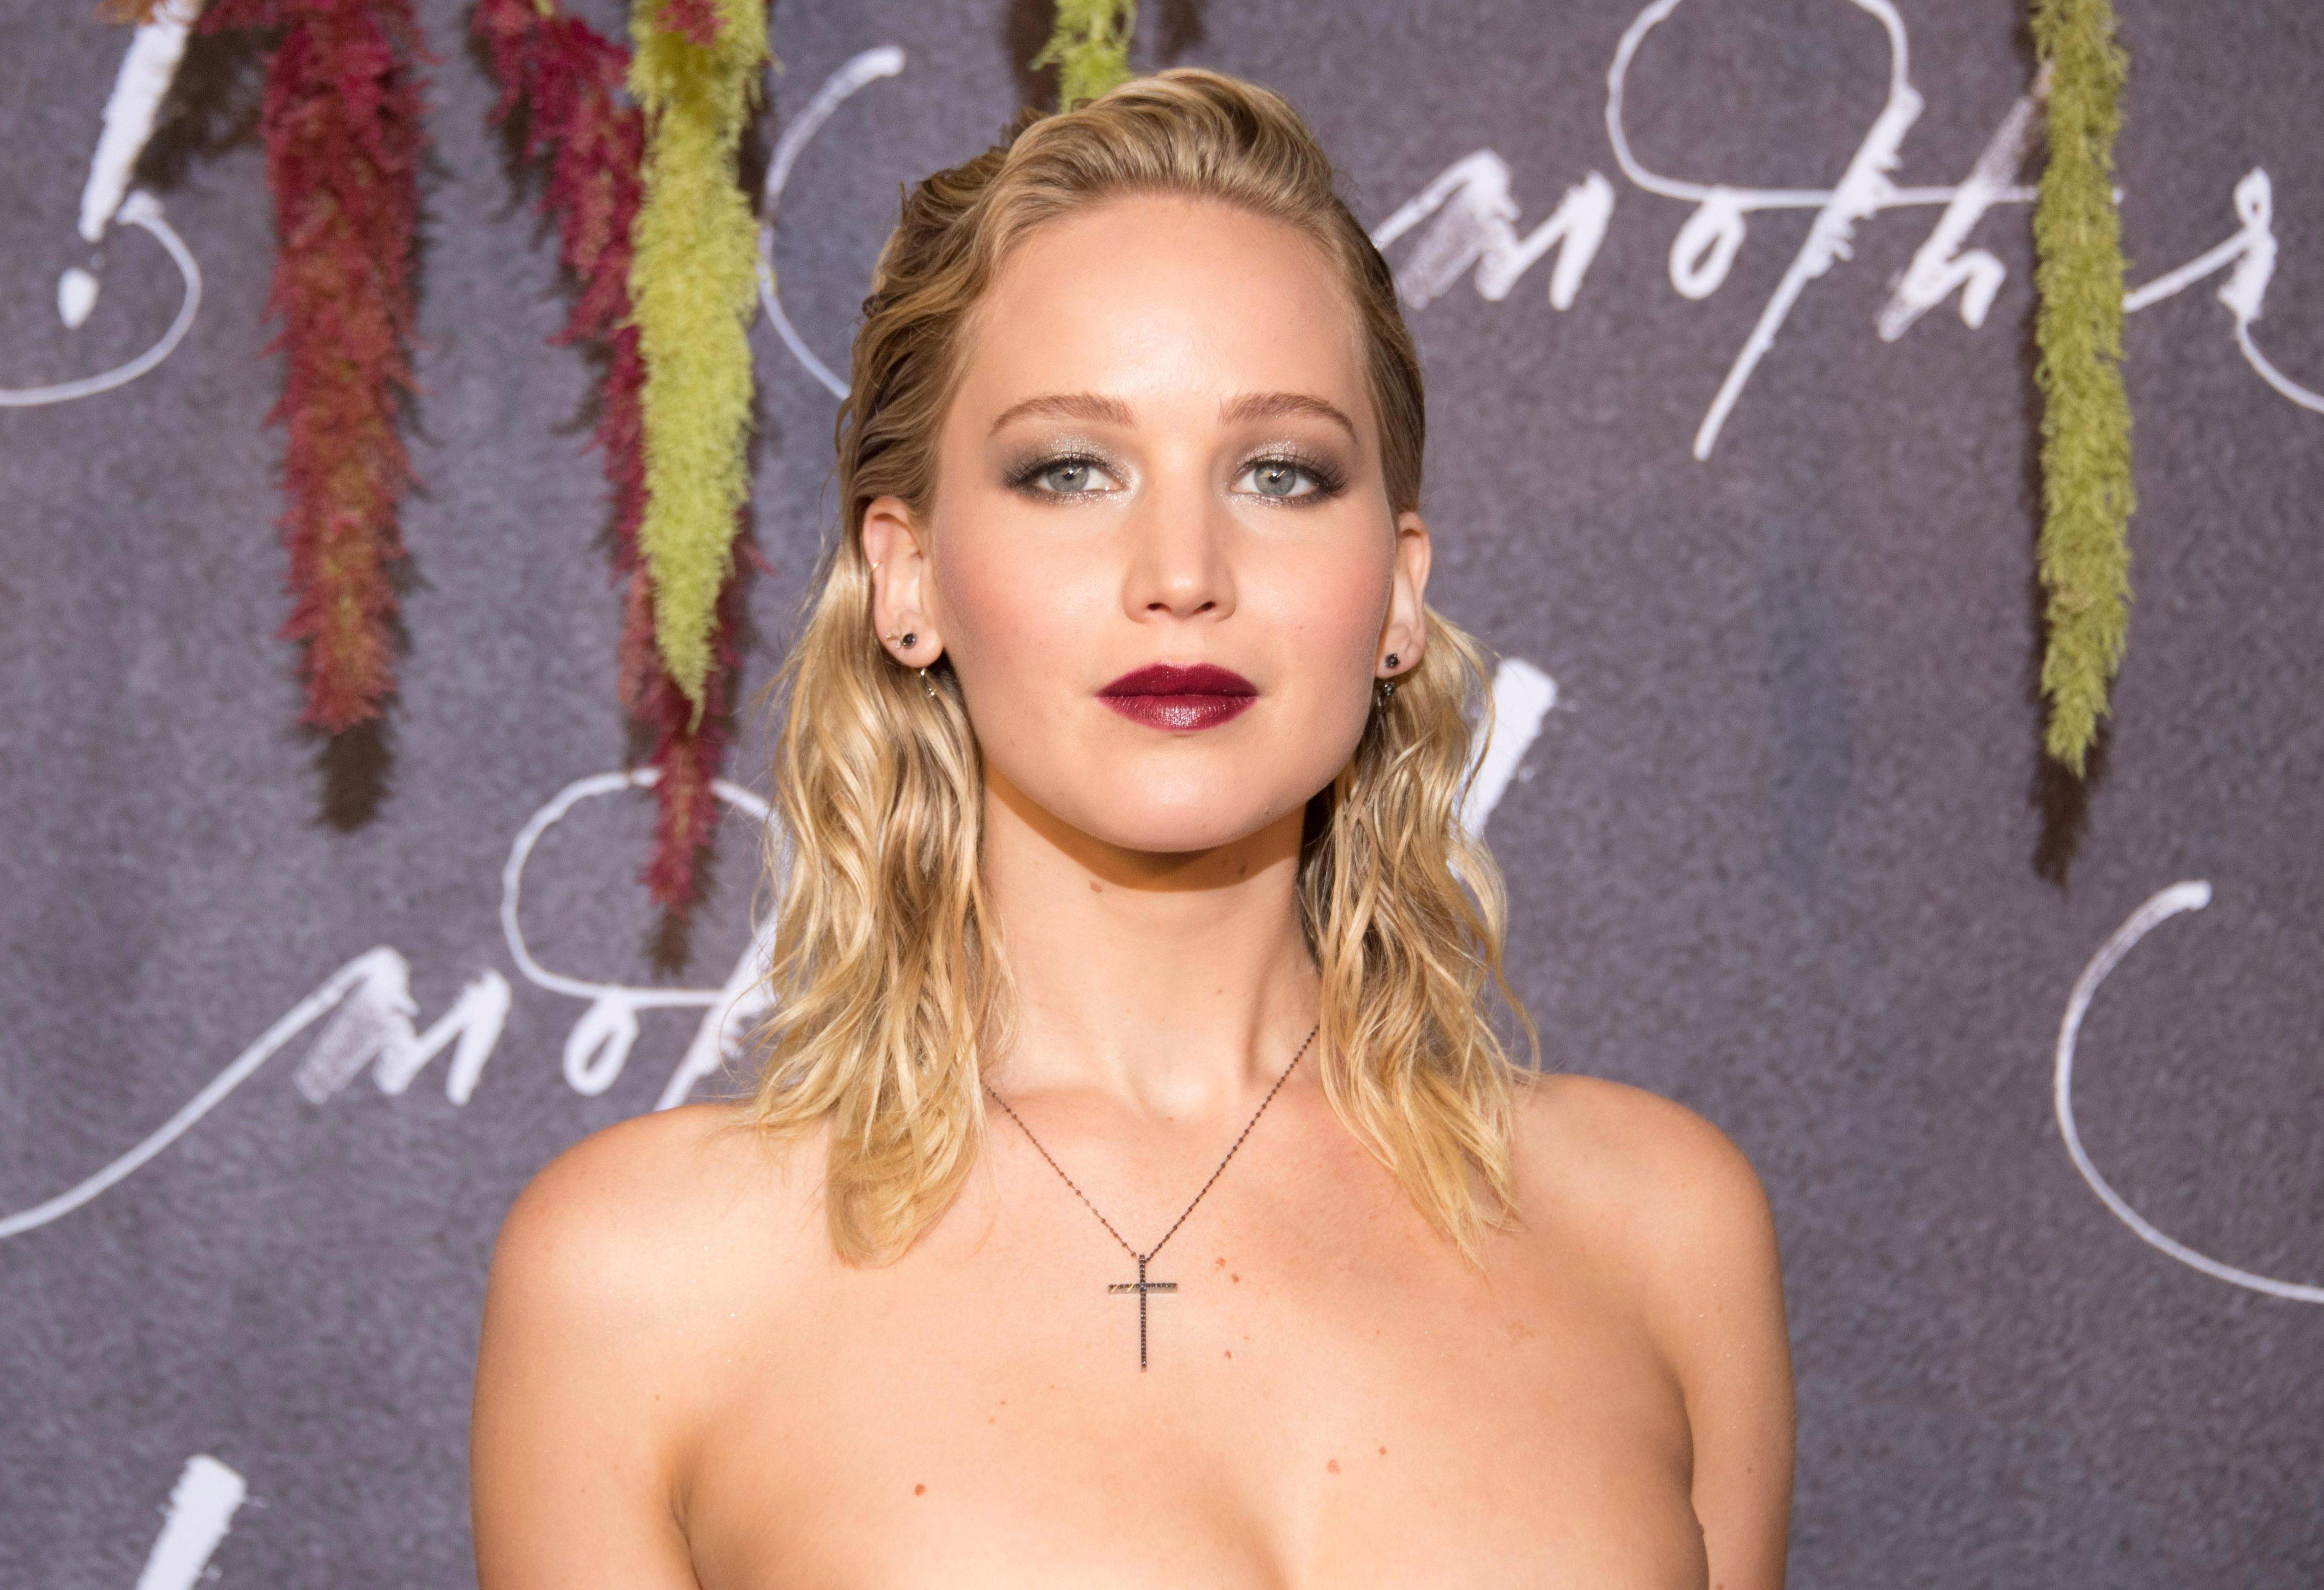 Naked Pics Of Jennifer Lawerence photo 22